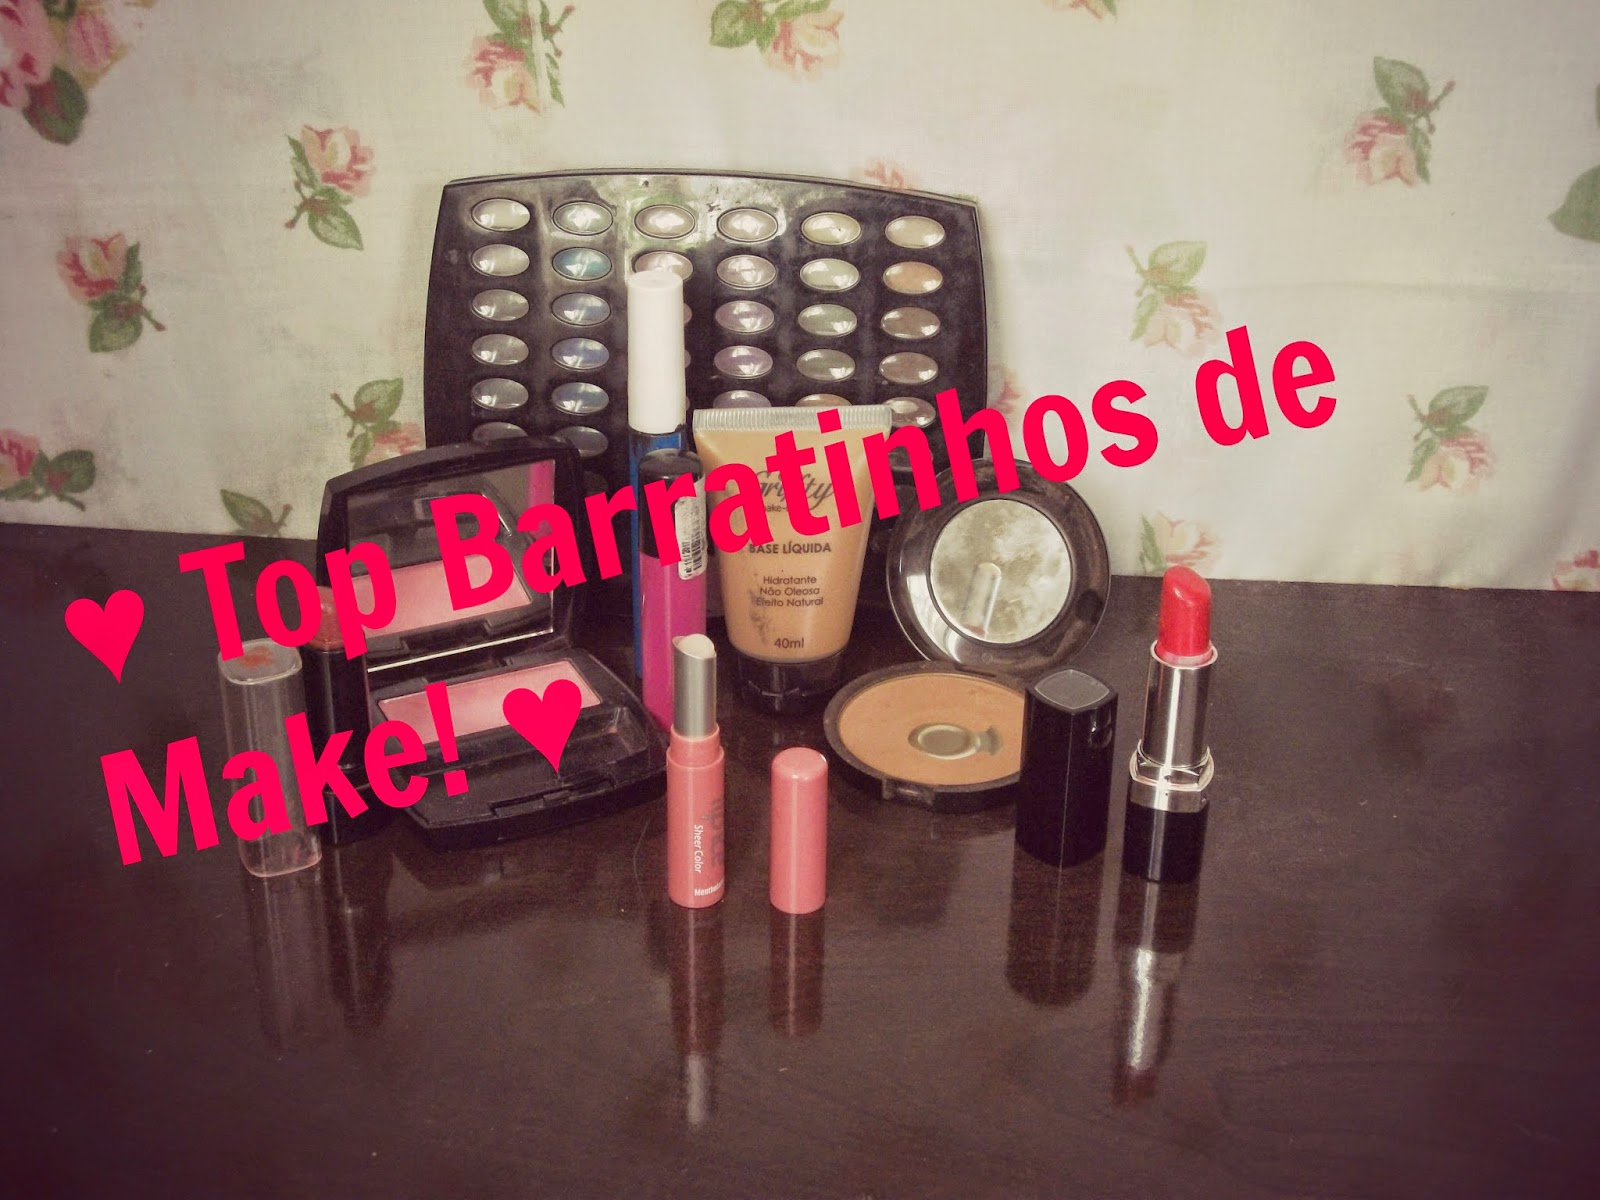 ♥ Vídeo: Top Baratinhos de Make! ♥